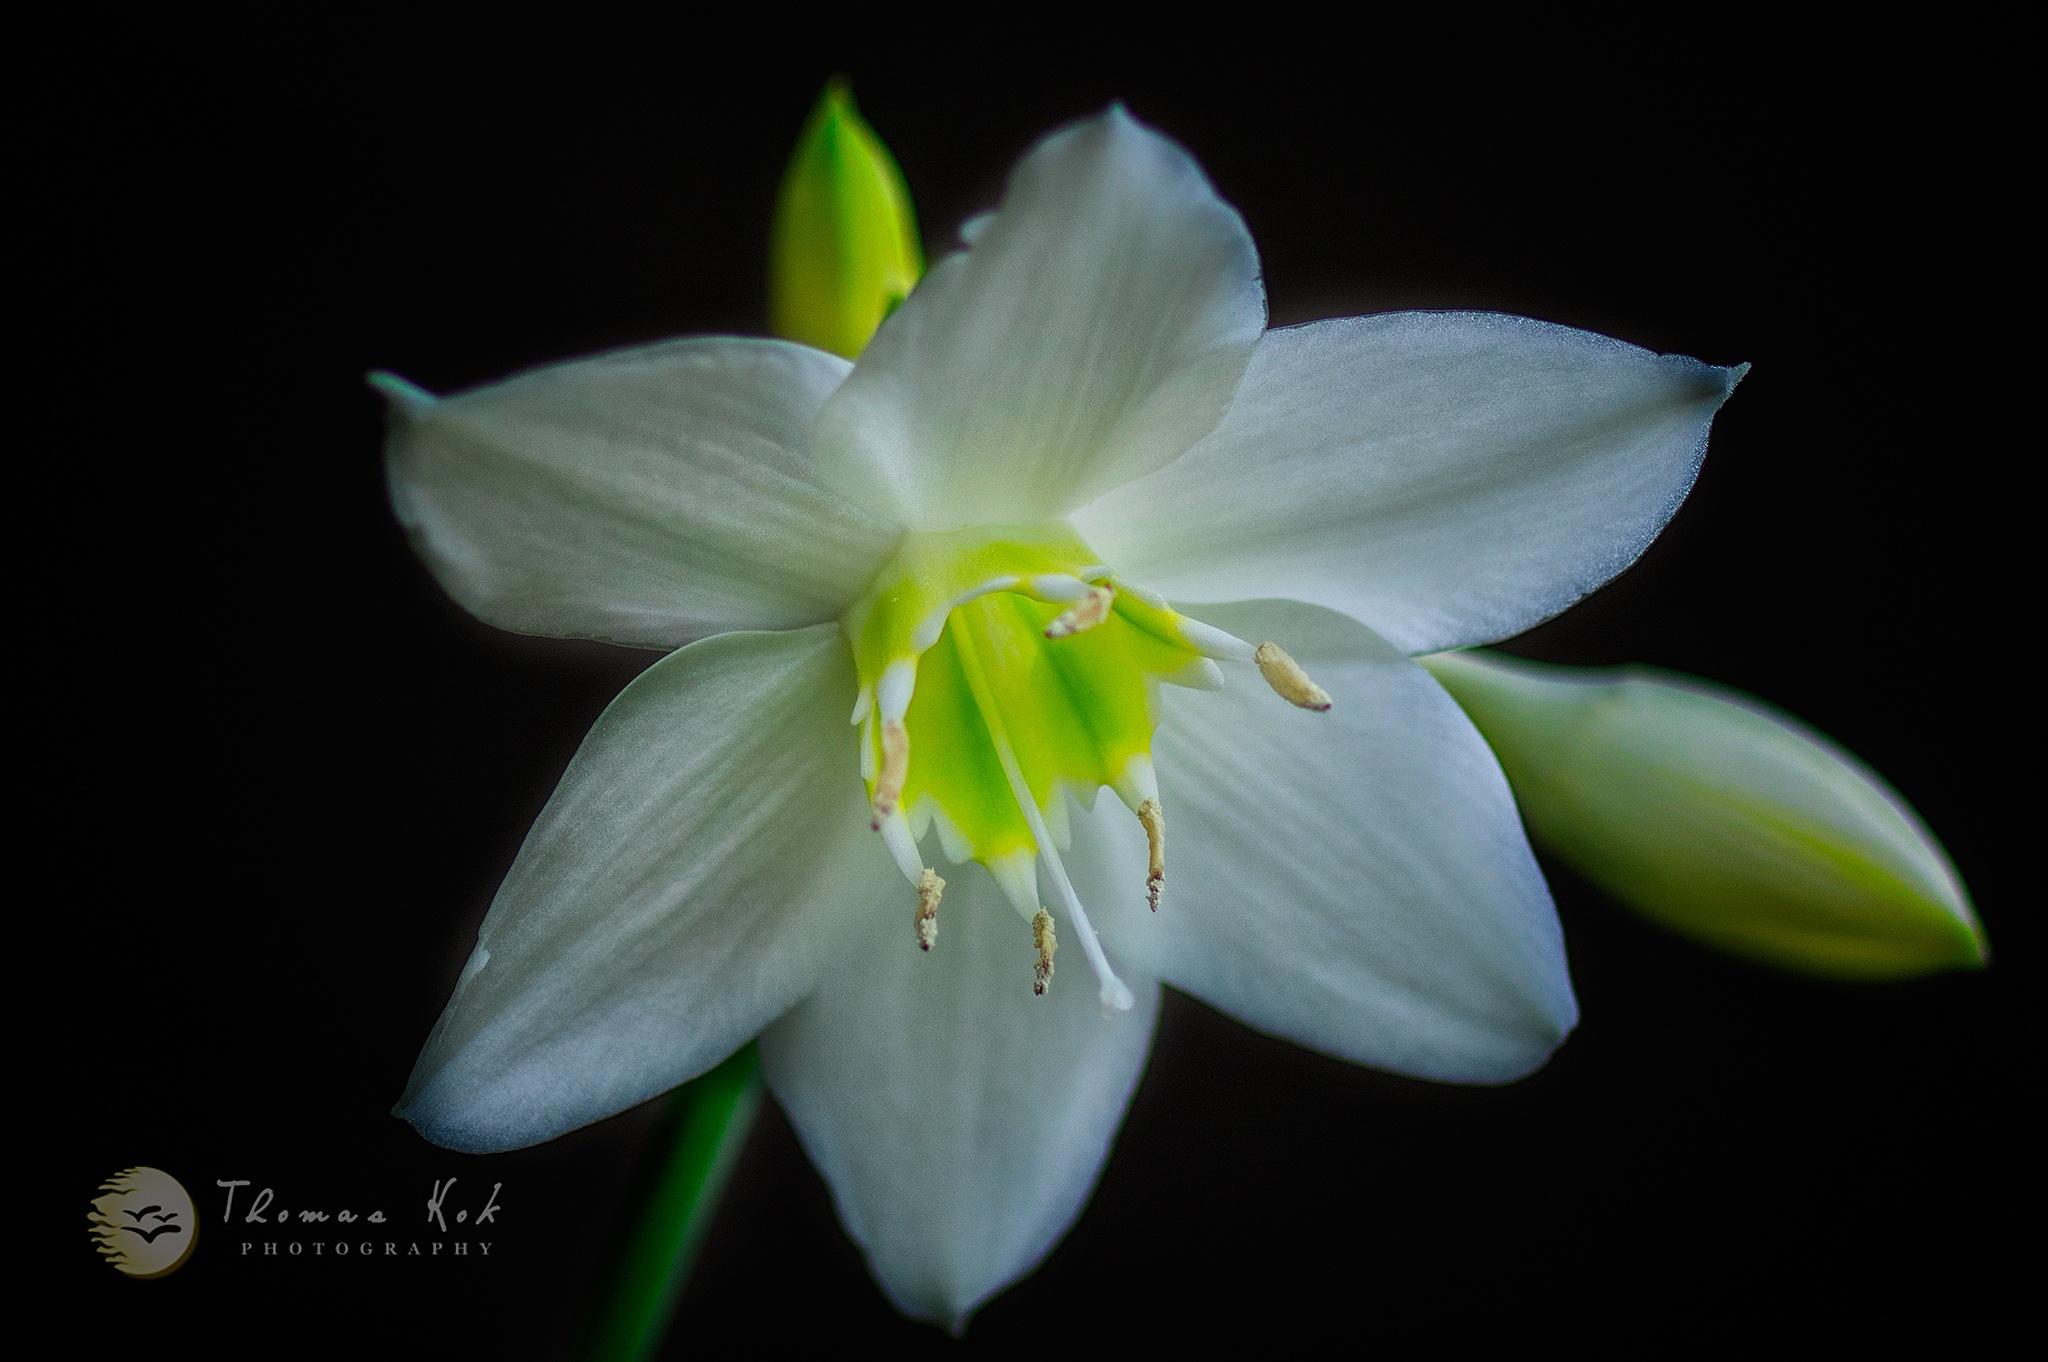 White Lily by Thomas D. Kok